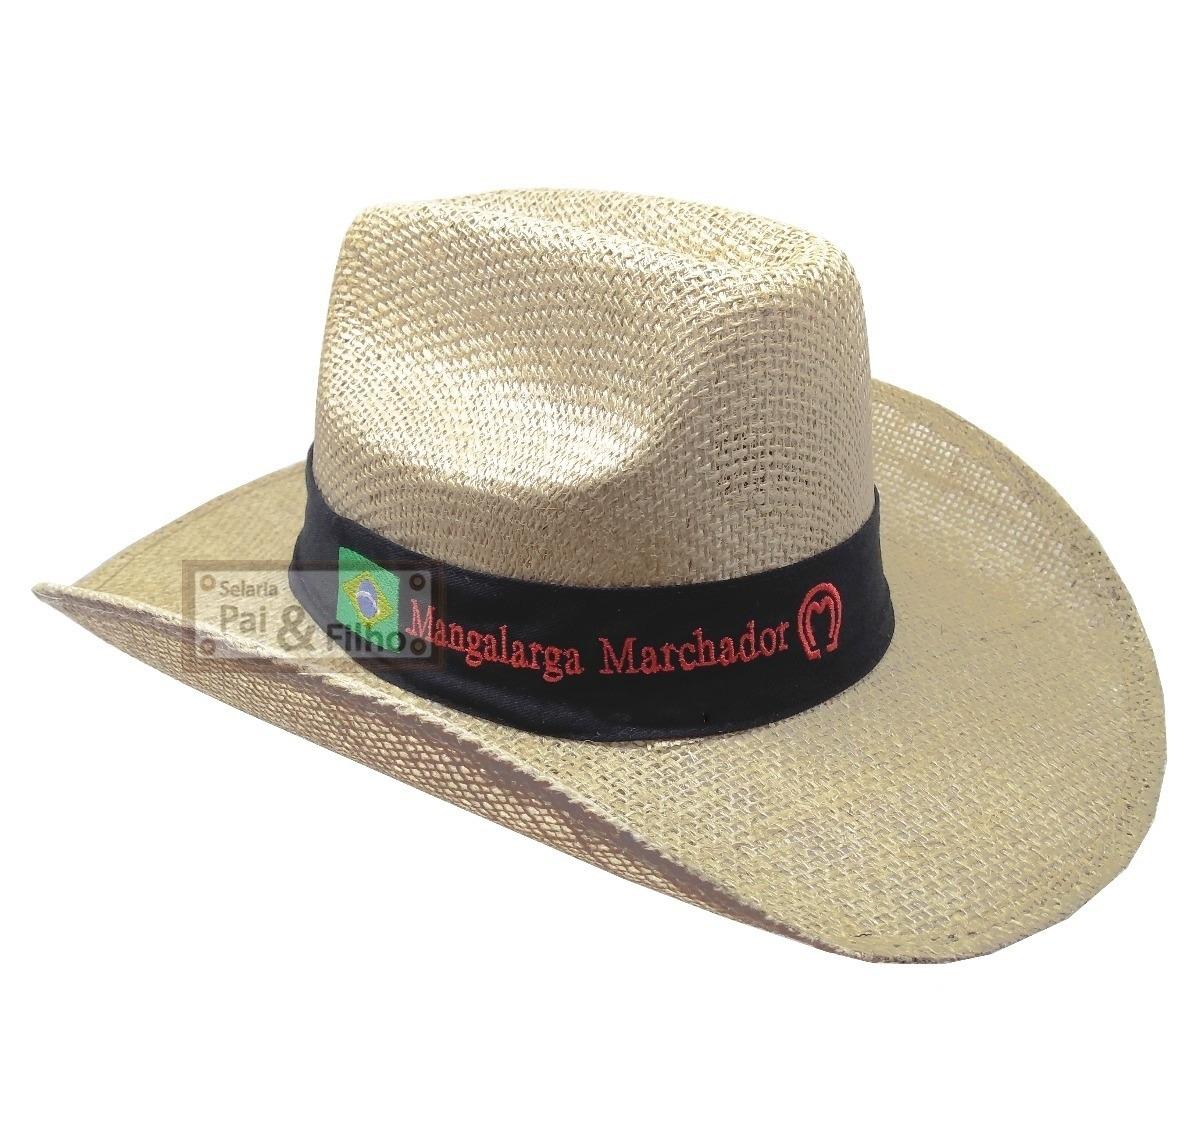 cc8ce0cd11 chapéu infantil mangalarga marchador luxo queima de estoque! Carregando  zoom.